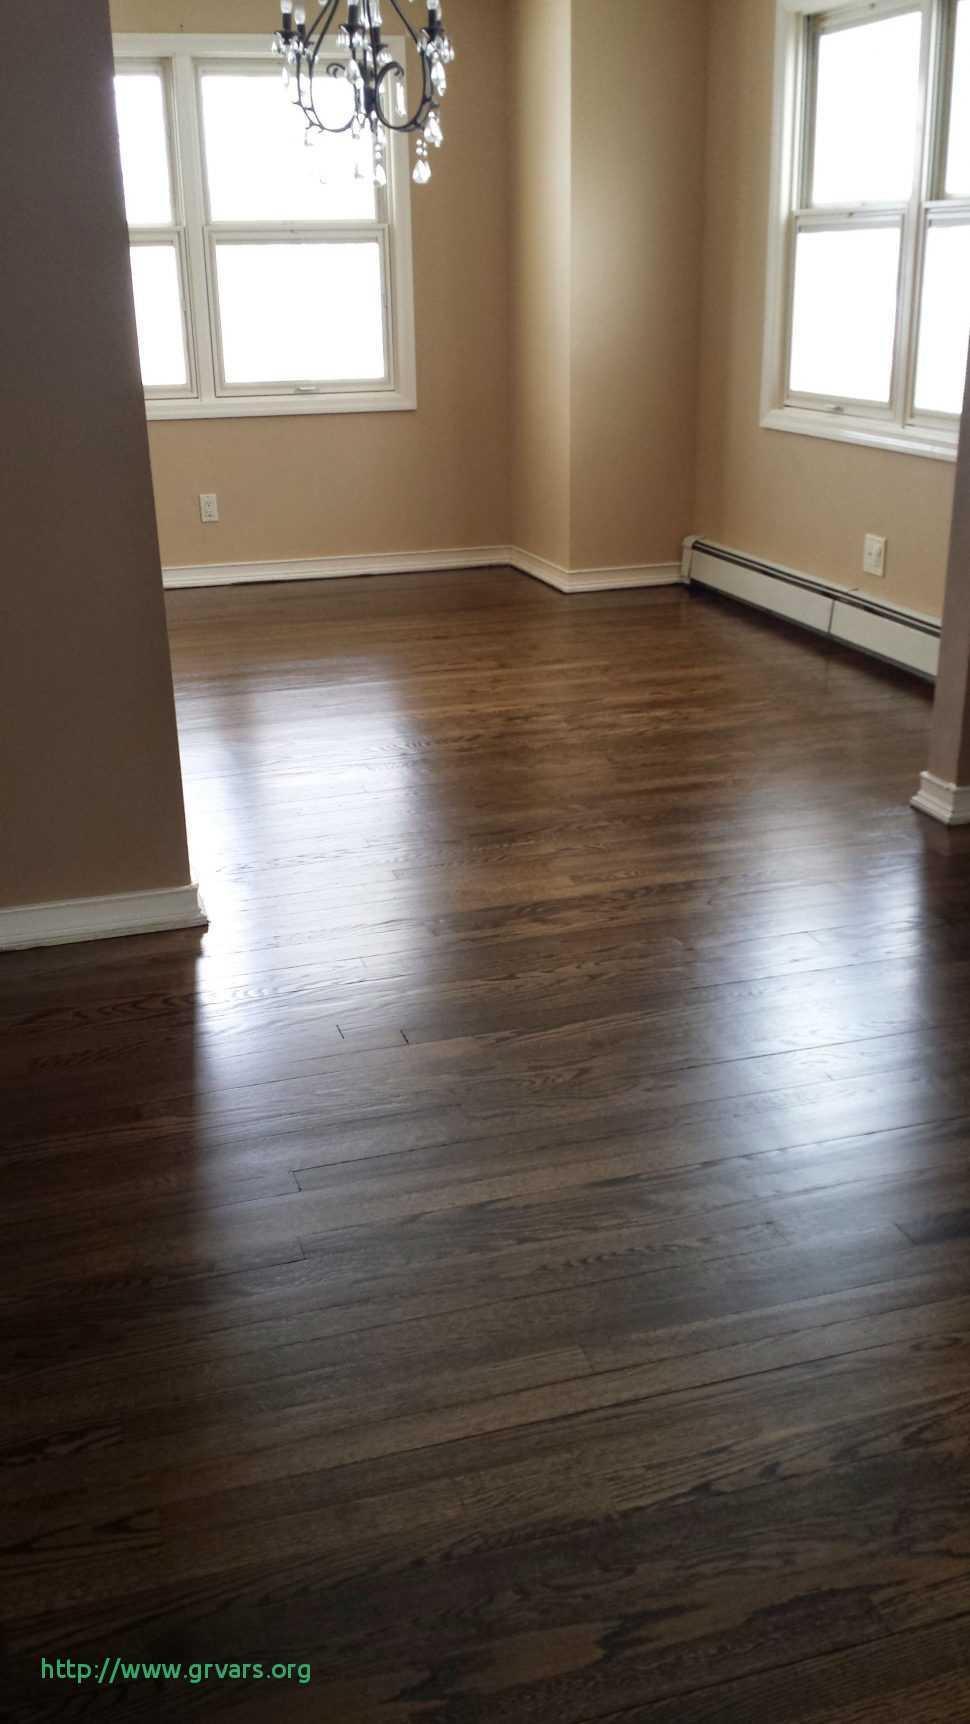 dg hardwood floors of diy wood floor refinishing awesome 5 things to know before inside diy wood floor refinishing inspirational 15 nouveau how to restore hardwood floors yourself